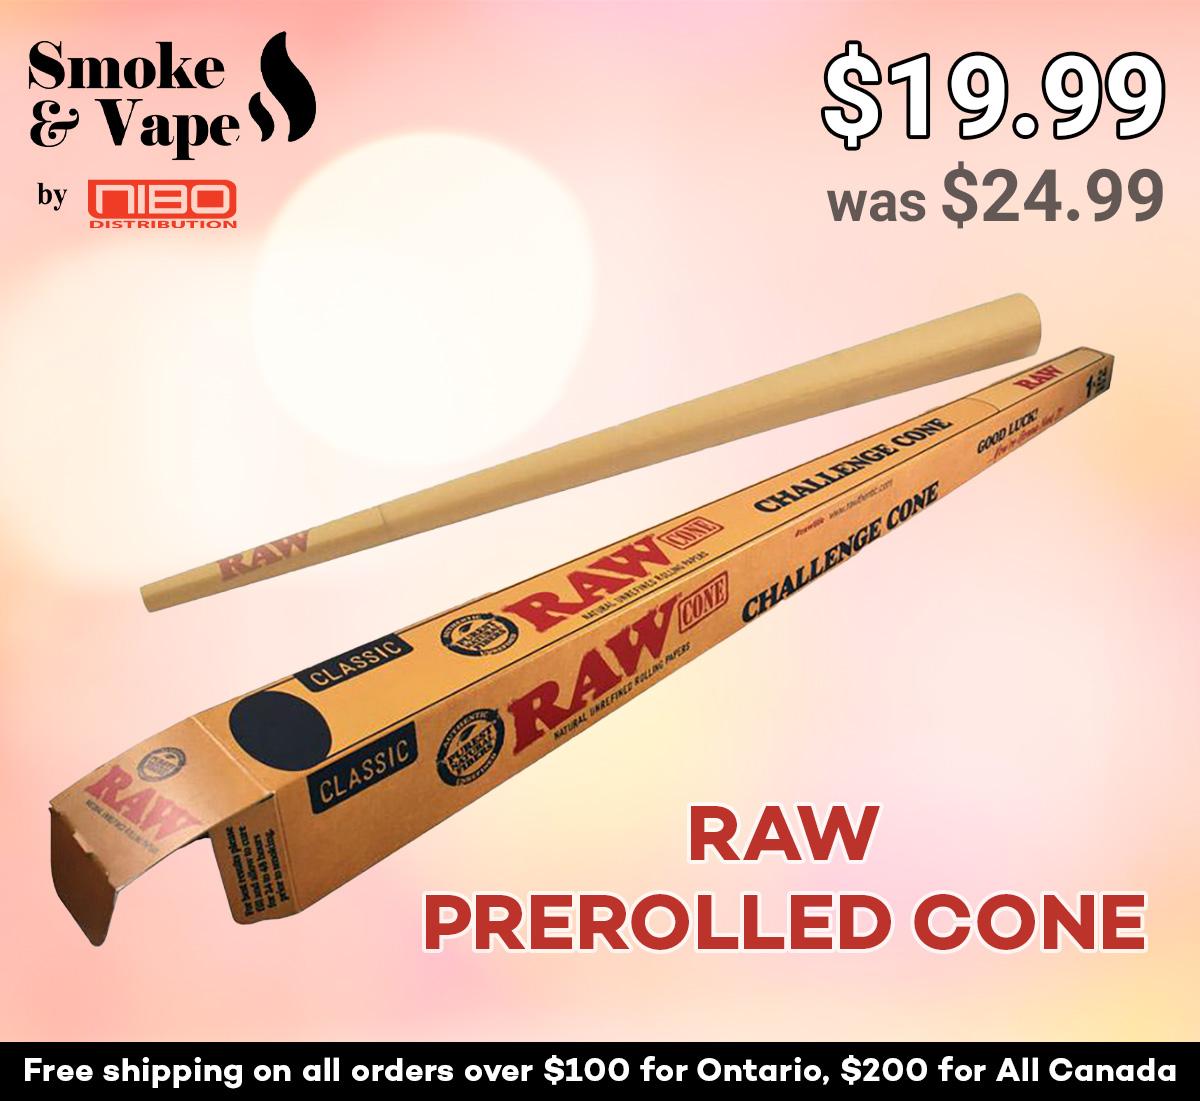 "RAW PREROLLED CONE - CHALLENGE (24"")  https://t.co/VeYSBEPMsL  #RAWPREROLLEDCONE #CONEMAESTRO #RAWTIPS #RAWPREROLLED #RawTubes #raw_rolling #tray #rawtray #smokeVape #smoking_accessory #rawtraymini #mini #mini_tray #canada #smoking https://t.co/aPFLG2PY28"